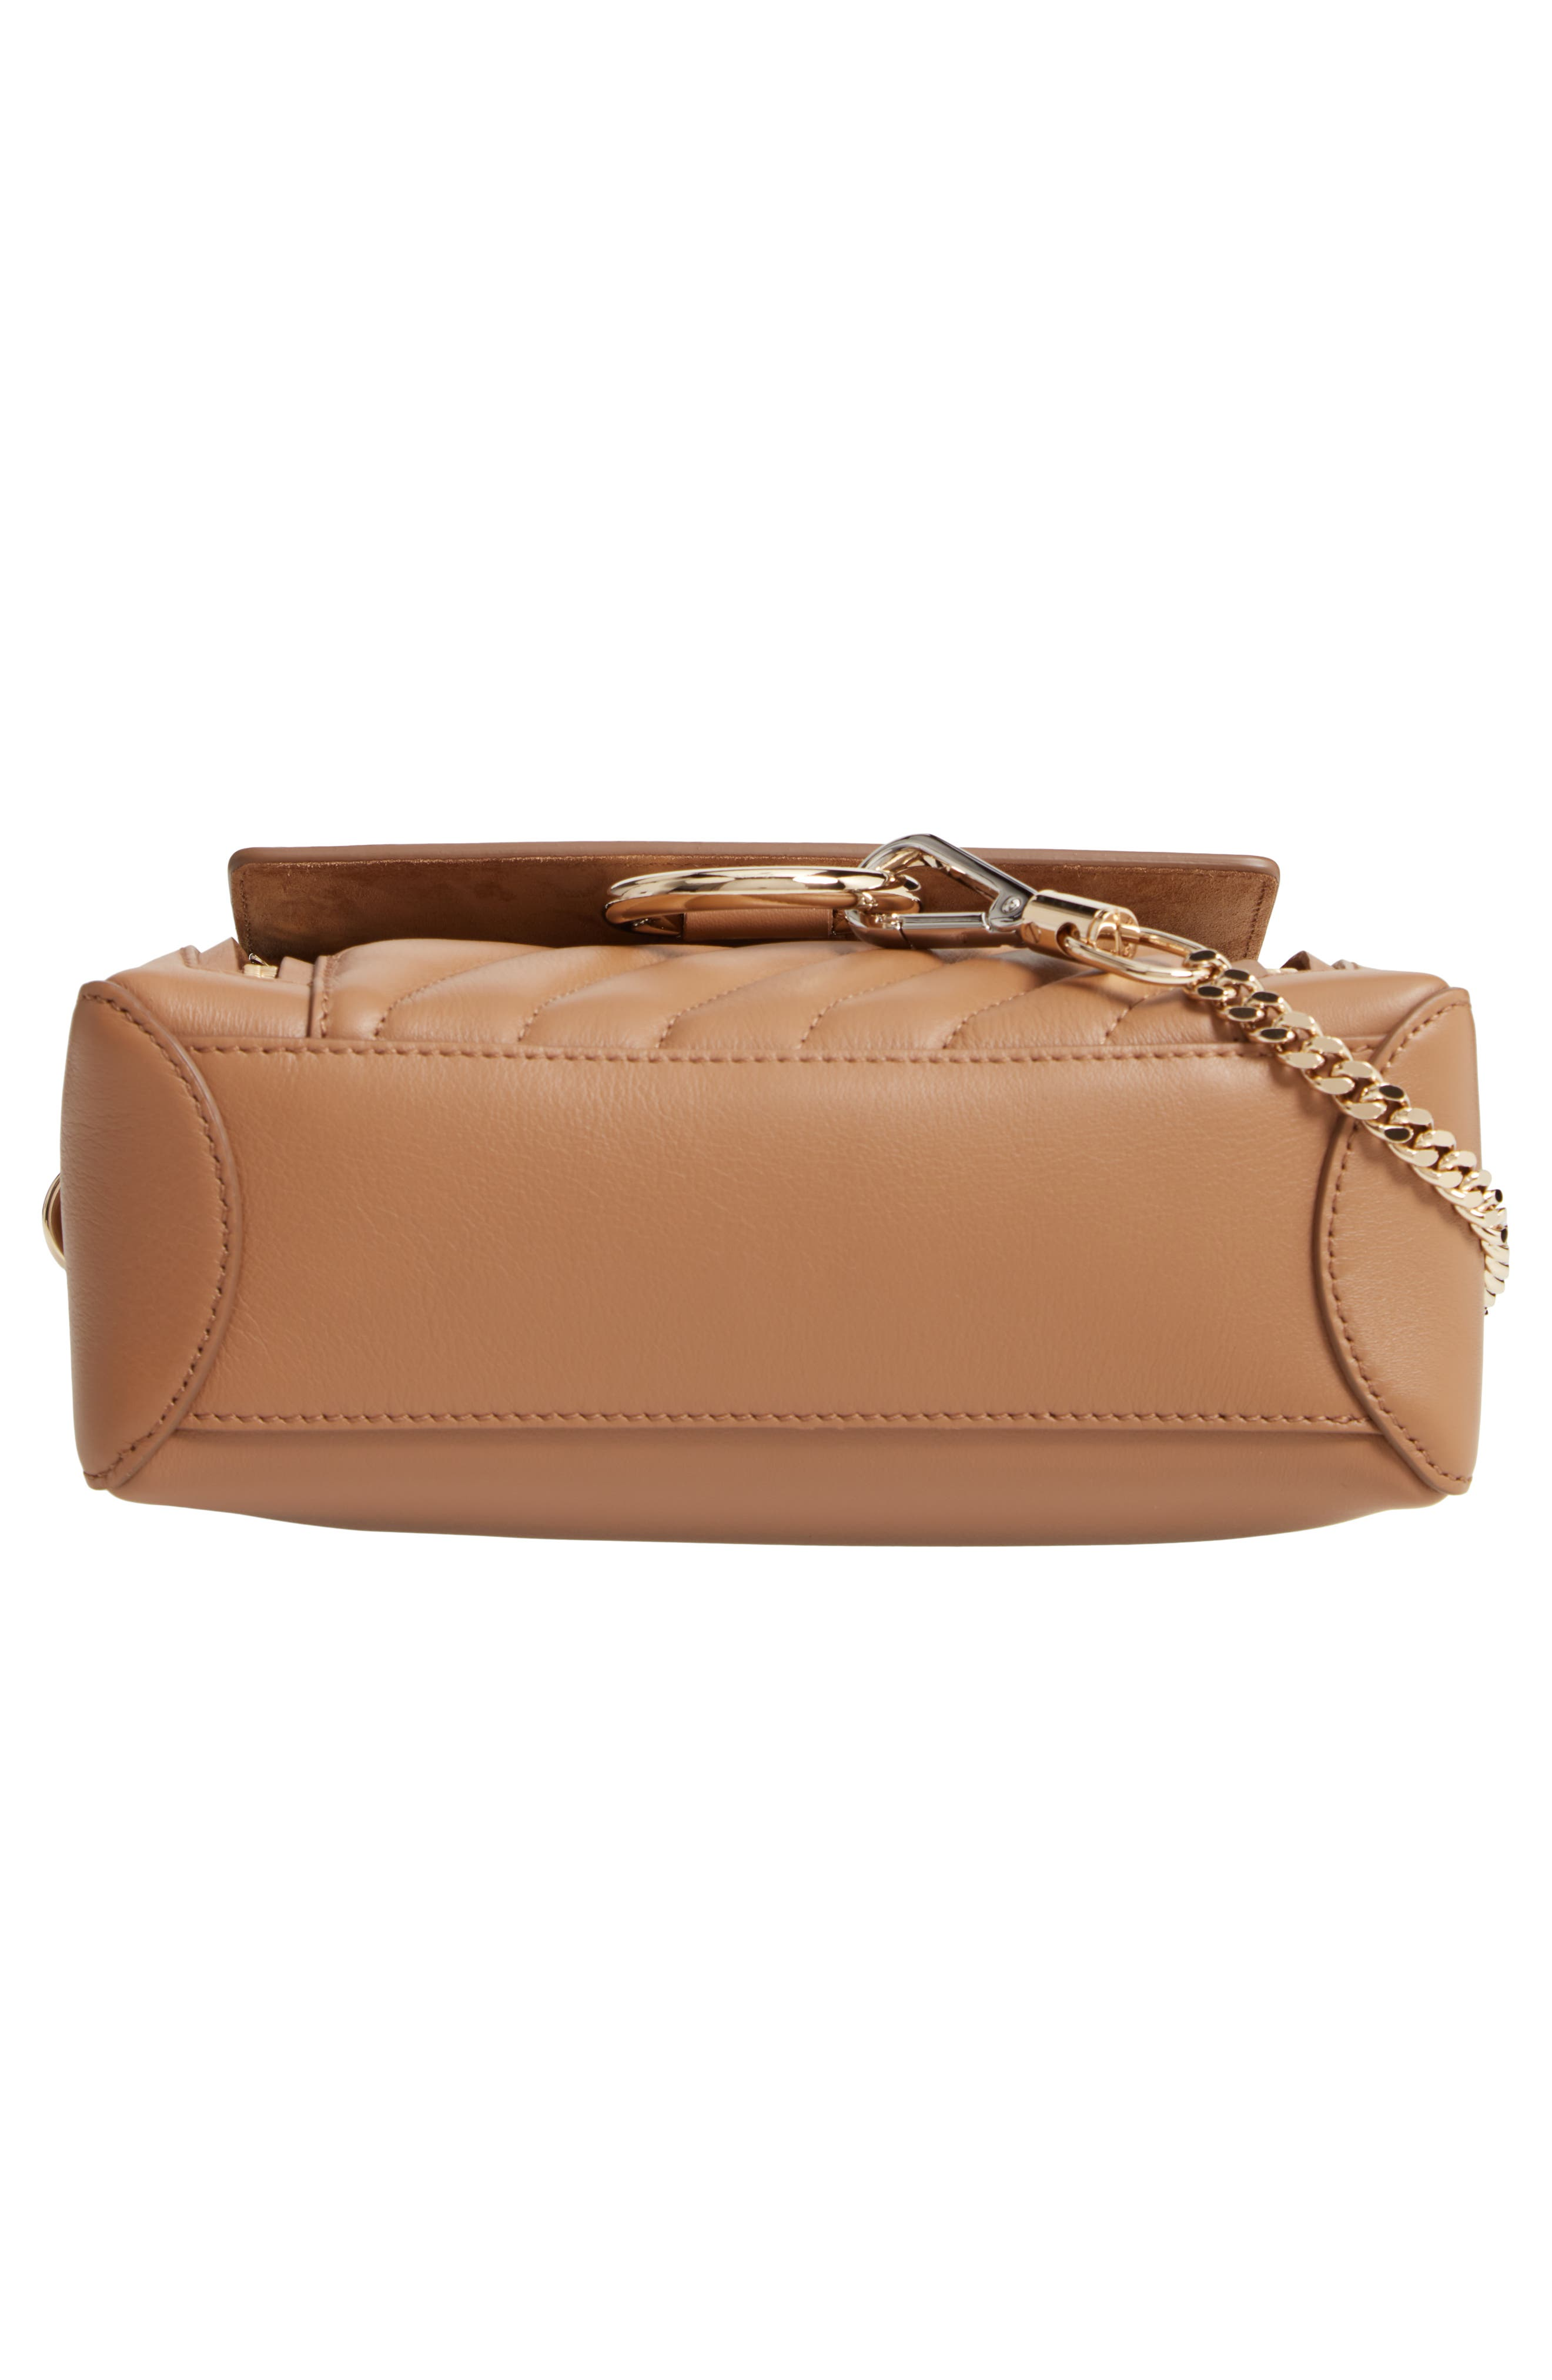 Mini Faye Day Leather Satchel,                             Alternate thumbnail 6, color,                             NUT